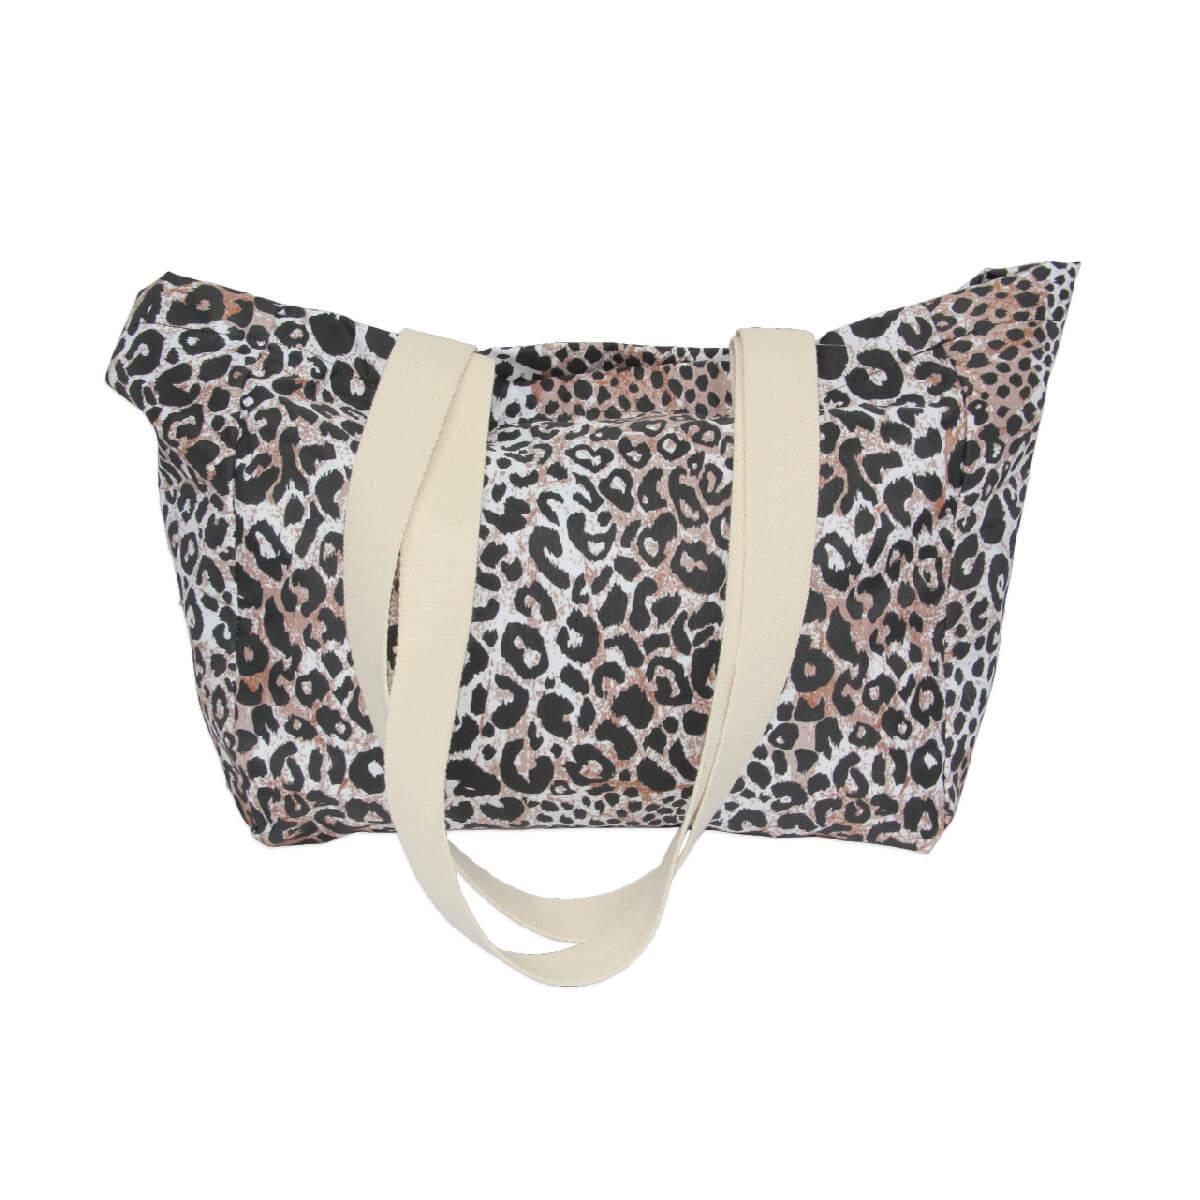 Custom Beach Bag: The Leopard Print - Standard